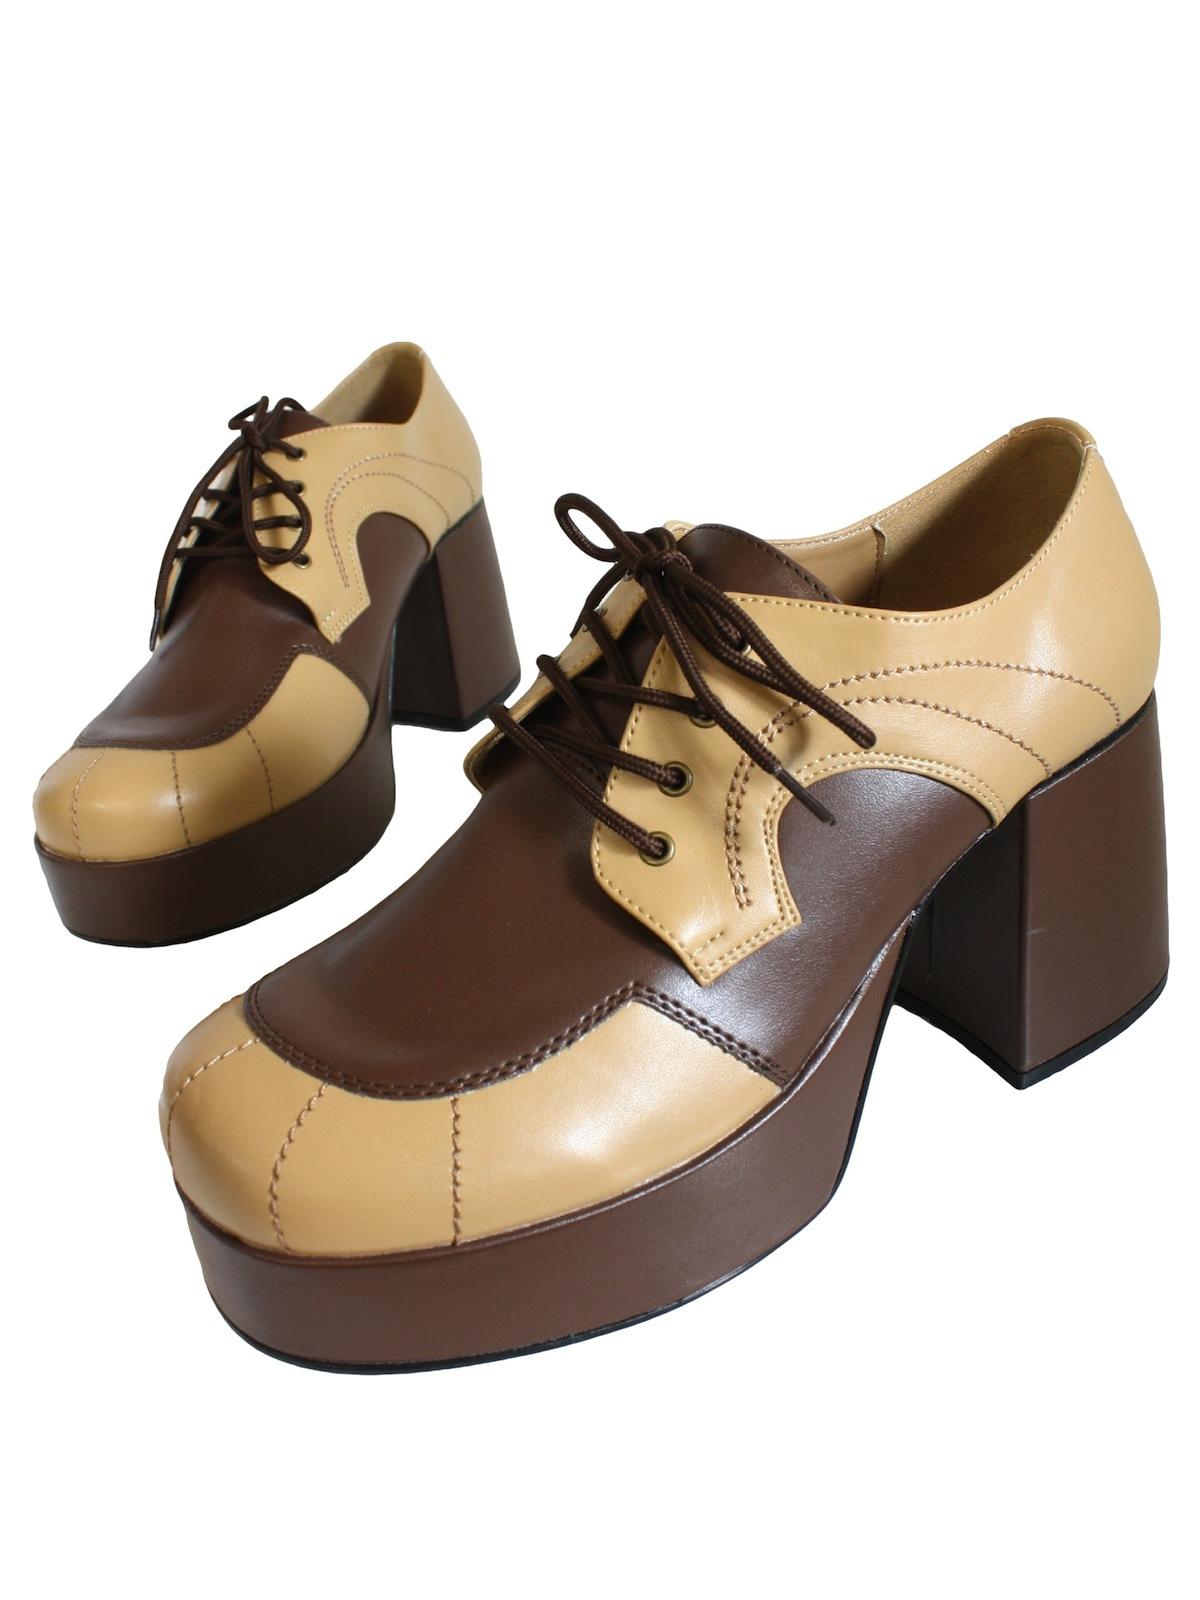 Vintage 70s Shoes: 70s reproduction